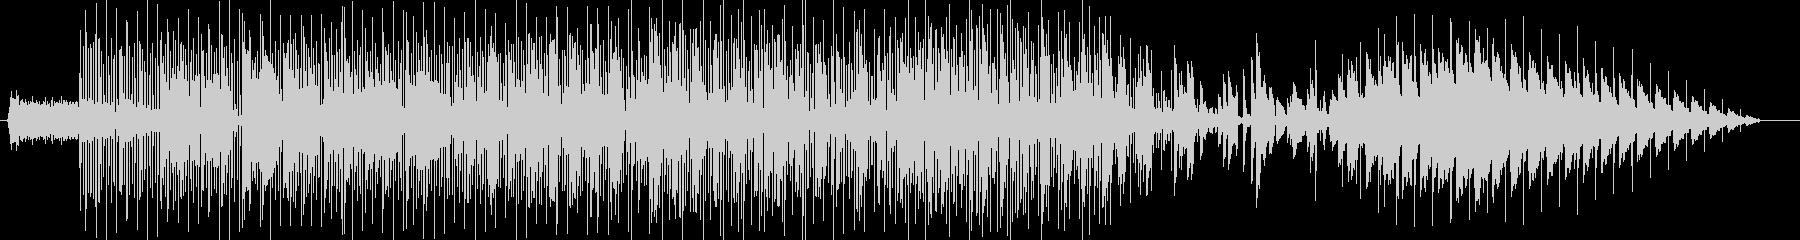 GANI GANIの未再生の波形